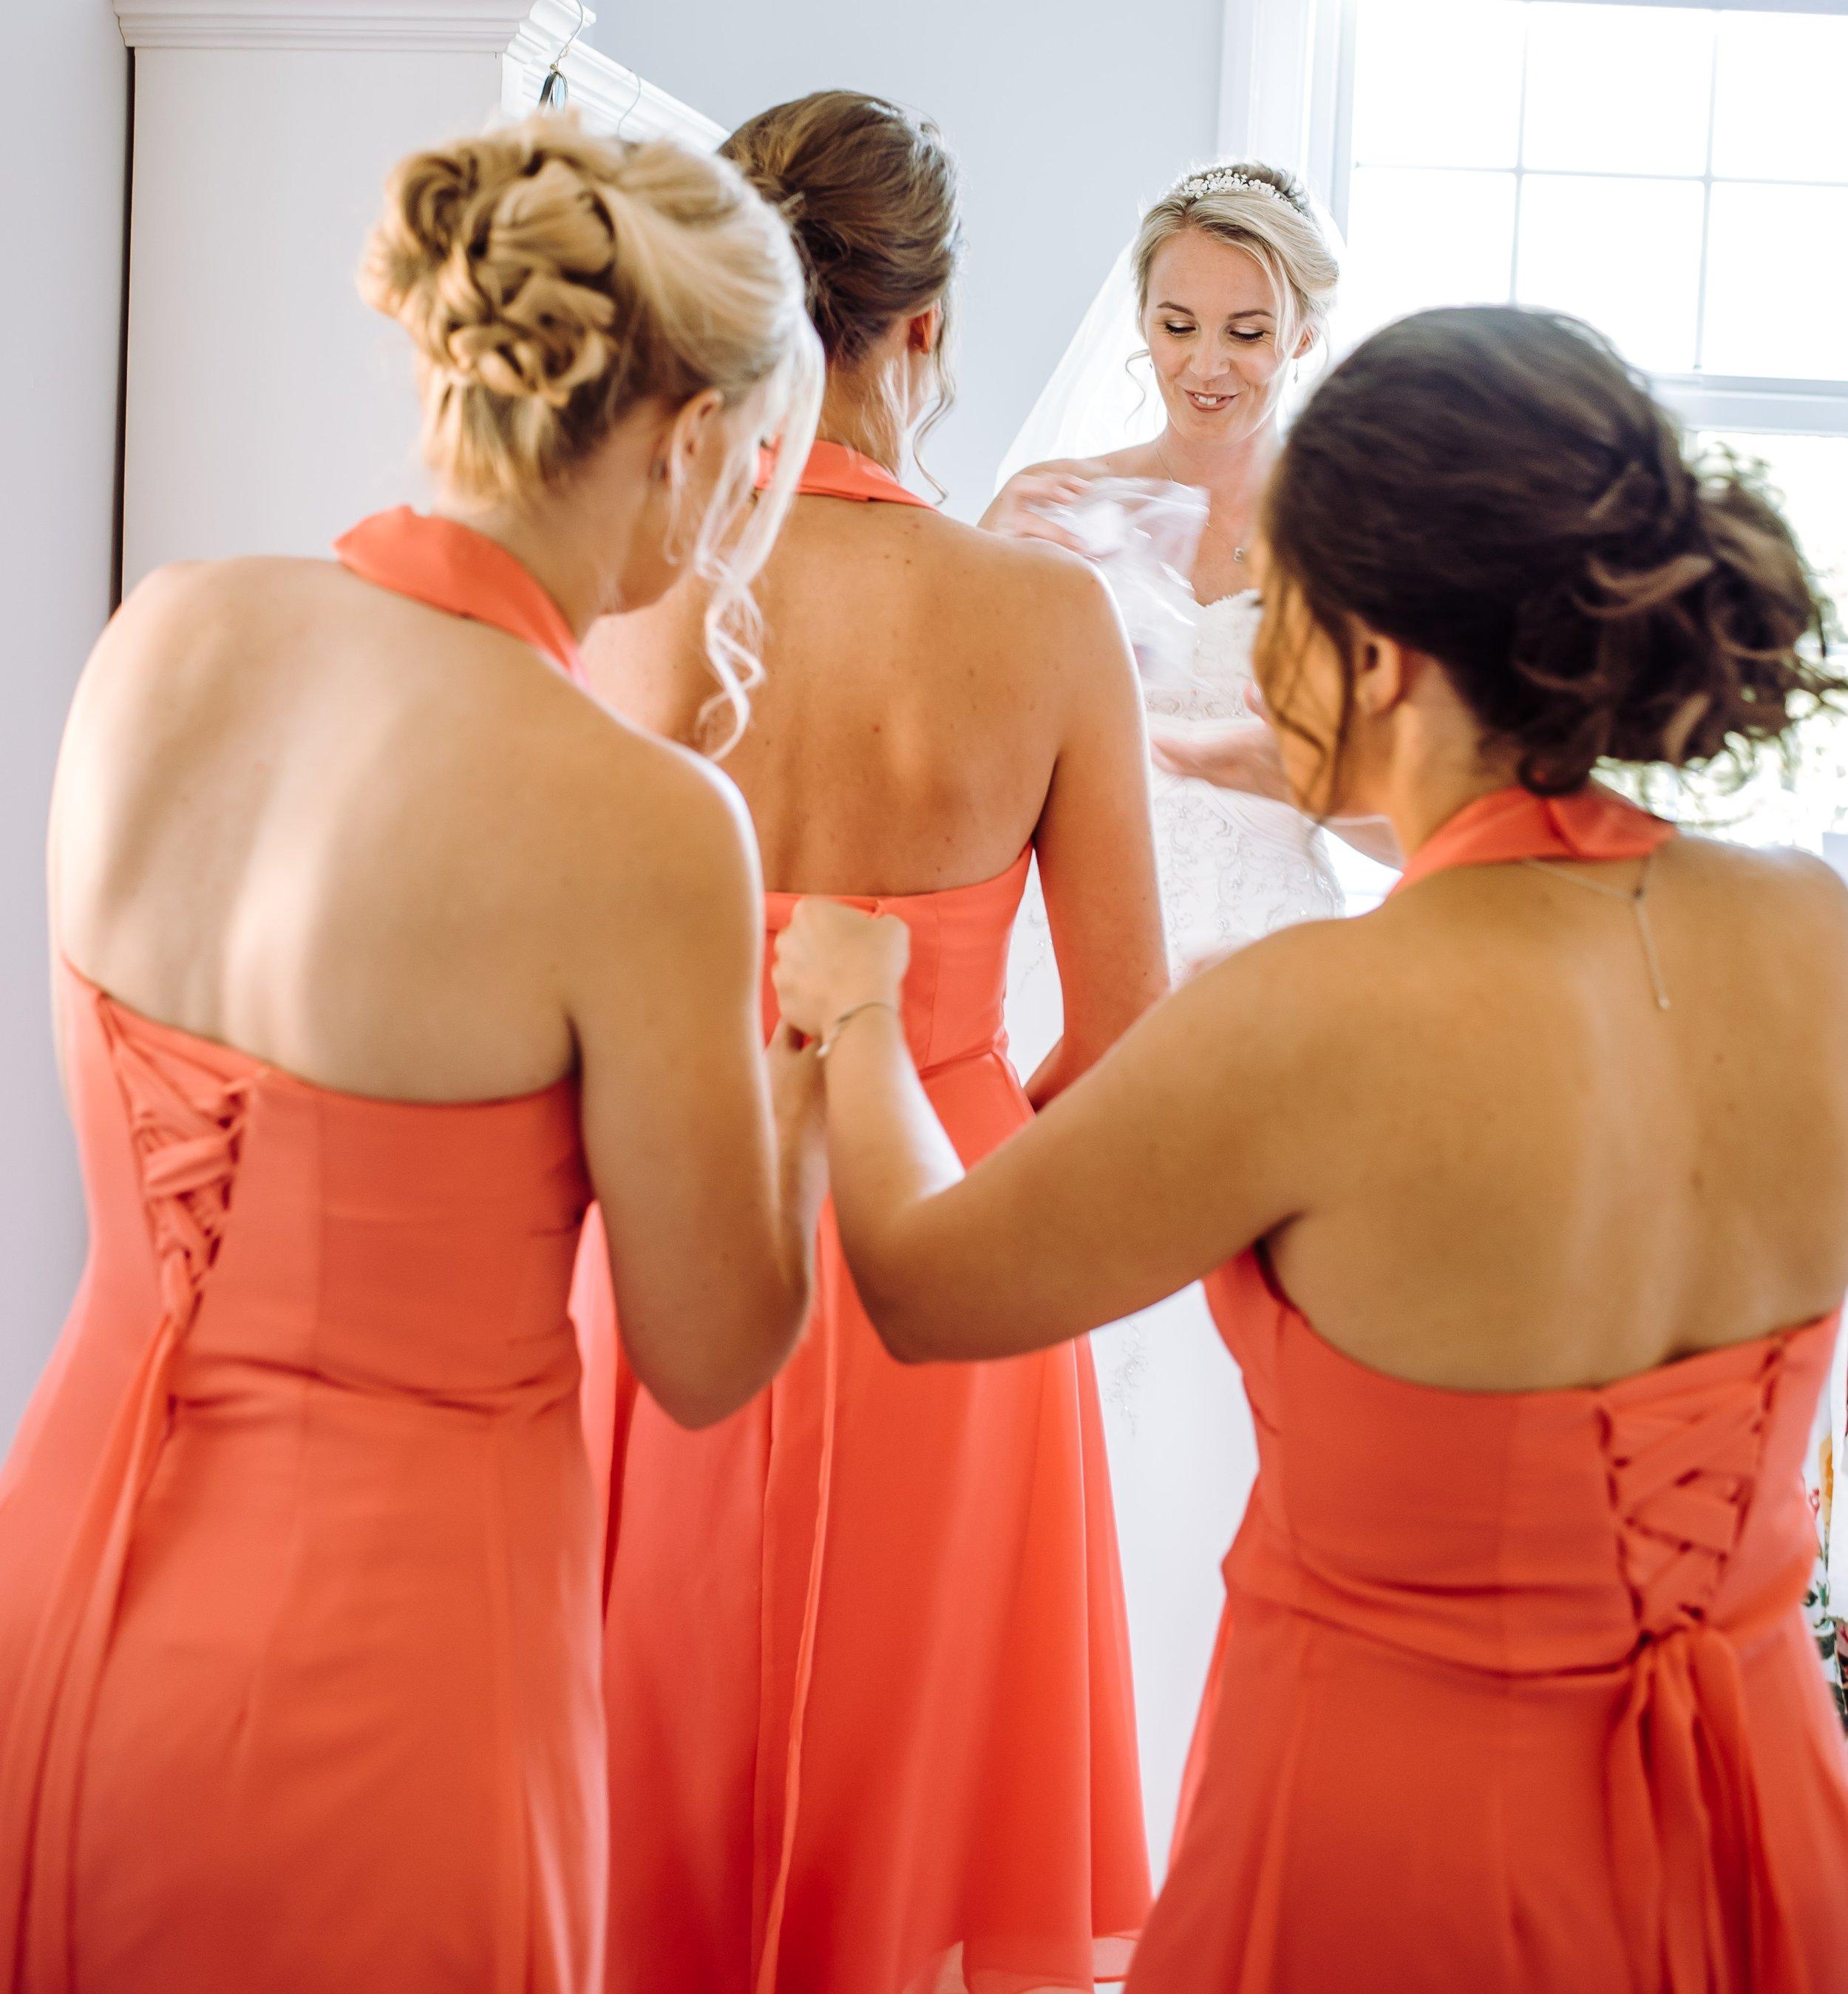 Vintage Wedding - East Sussex Wedding Photographer_0183.jpg